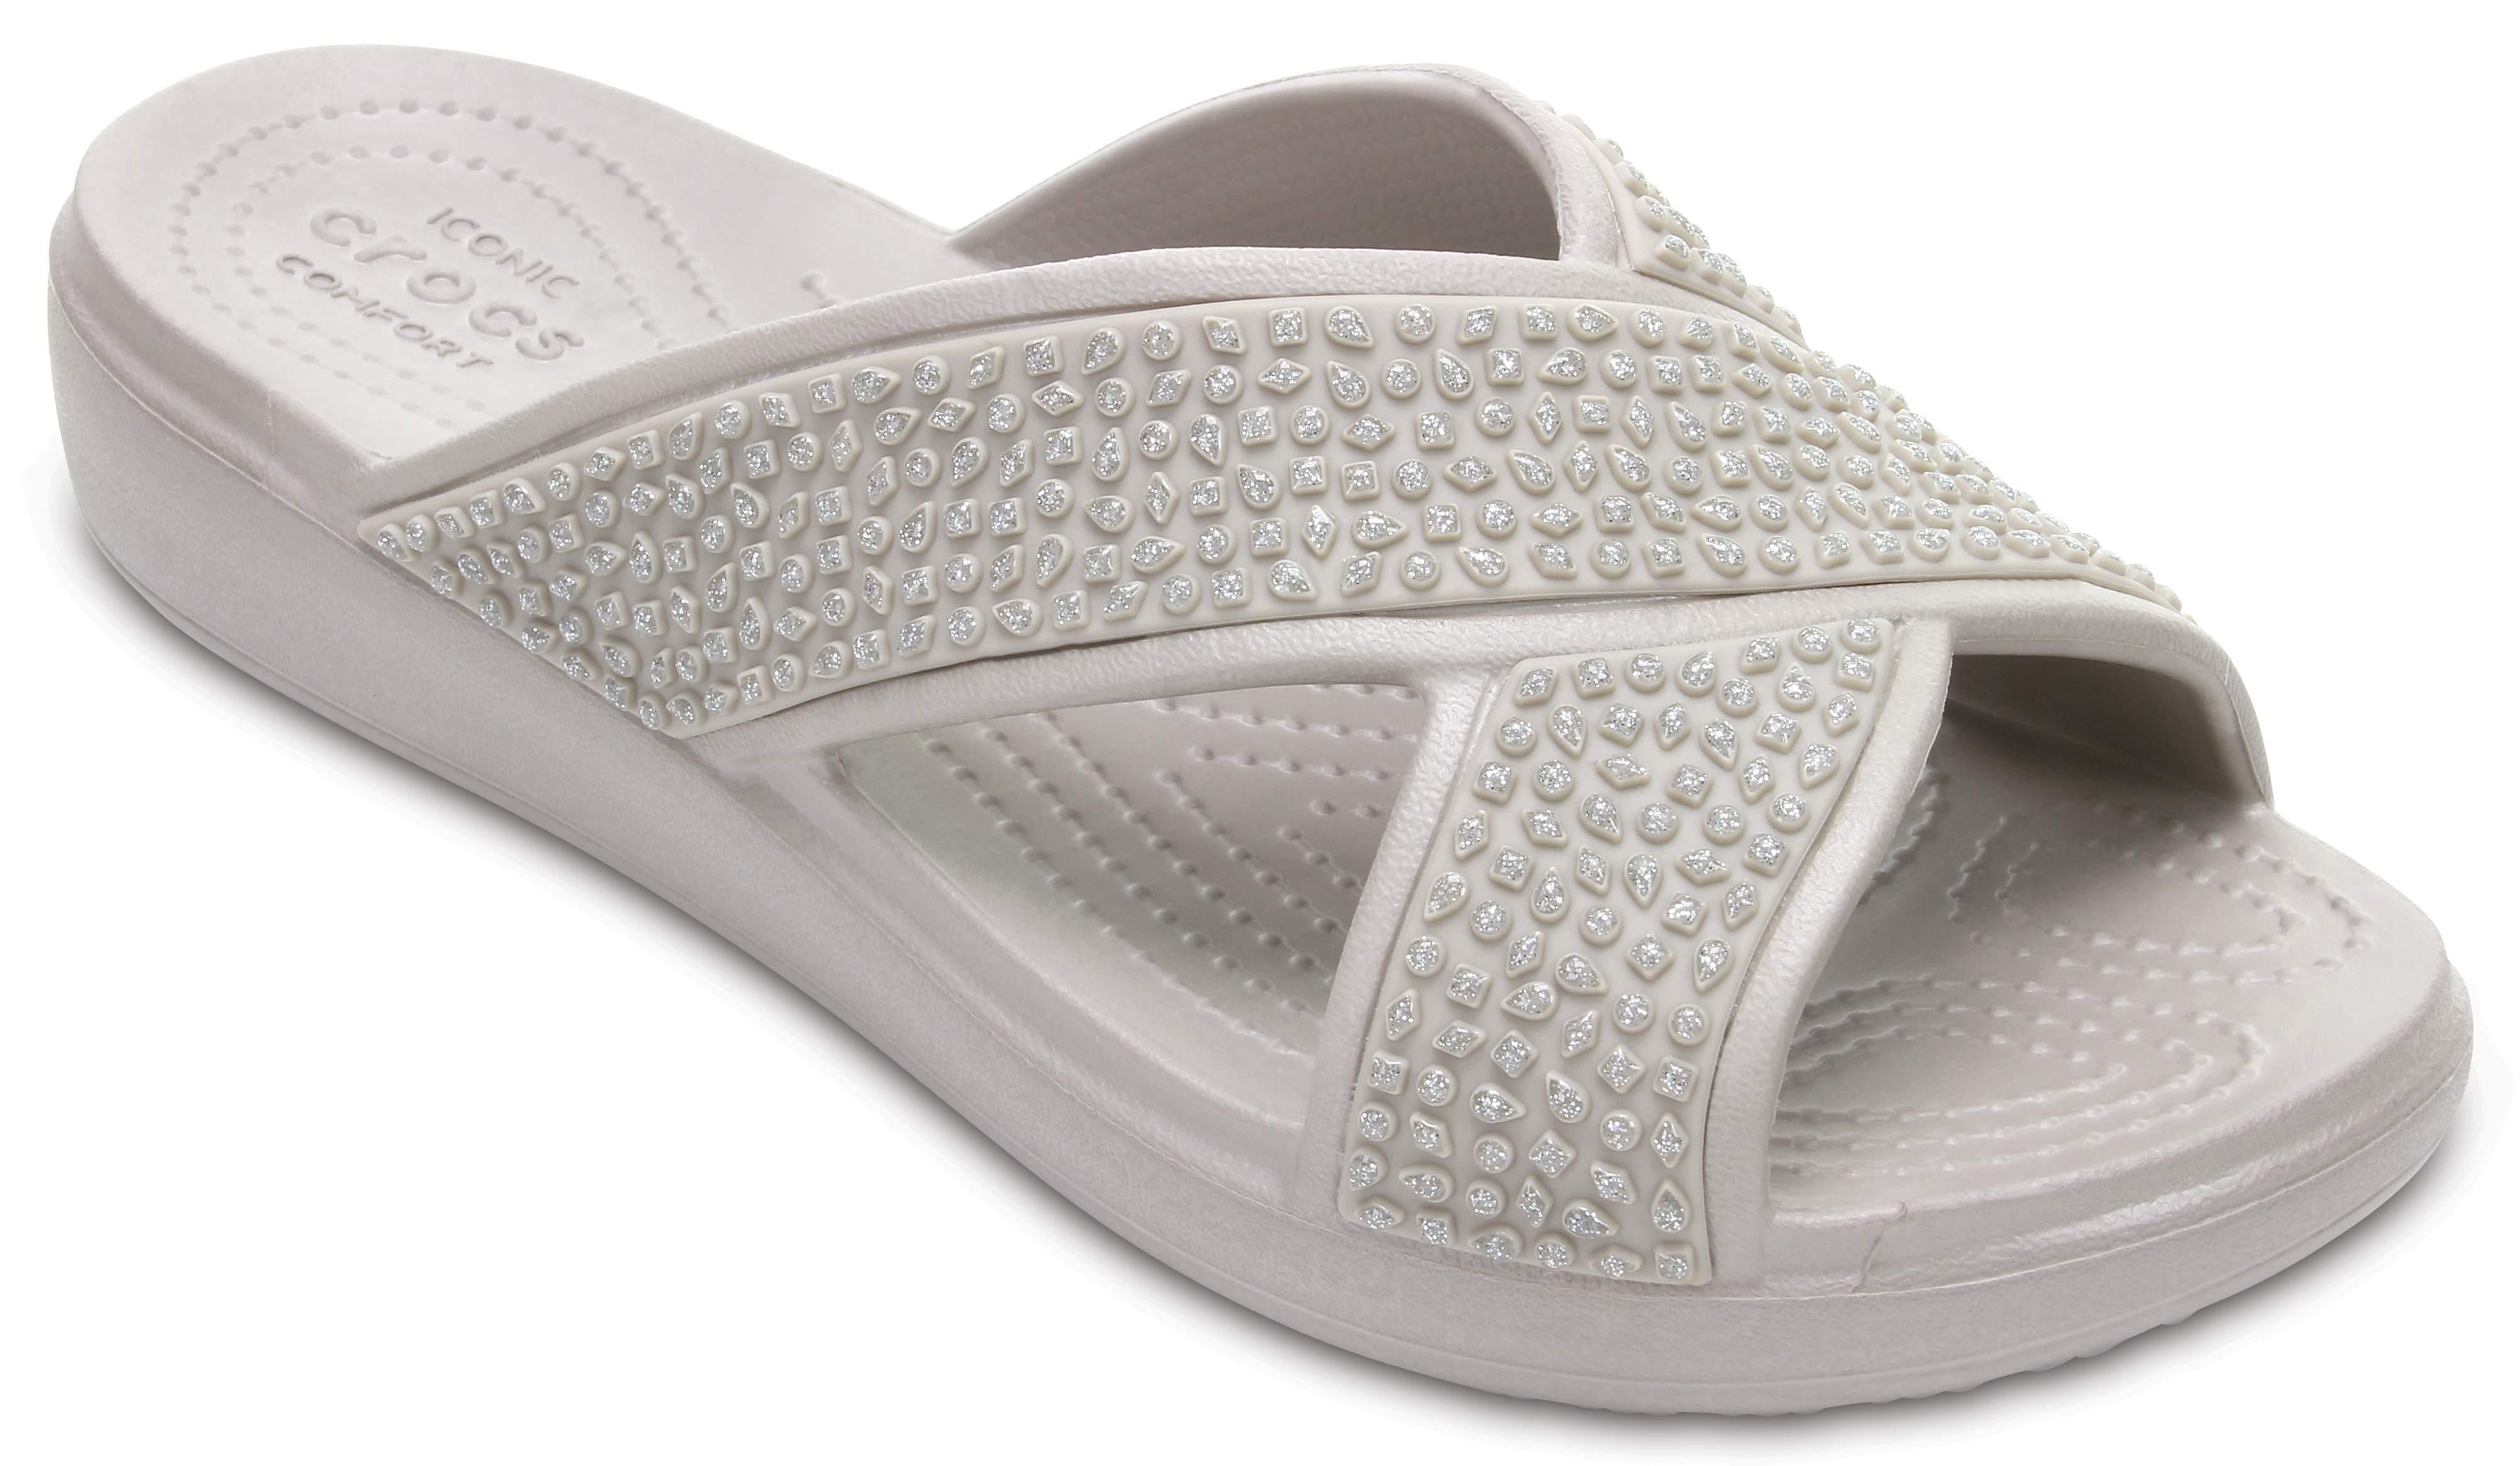 Crocs Sloane Embellished ... Women's Sandals